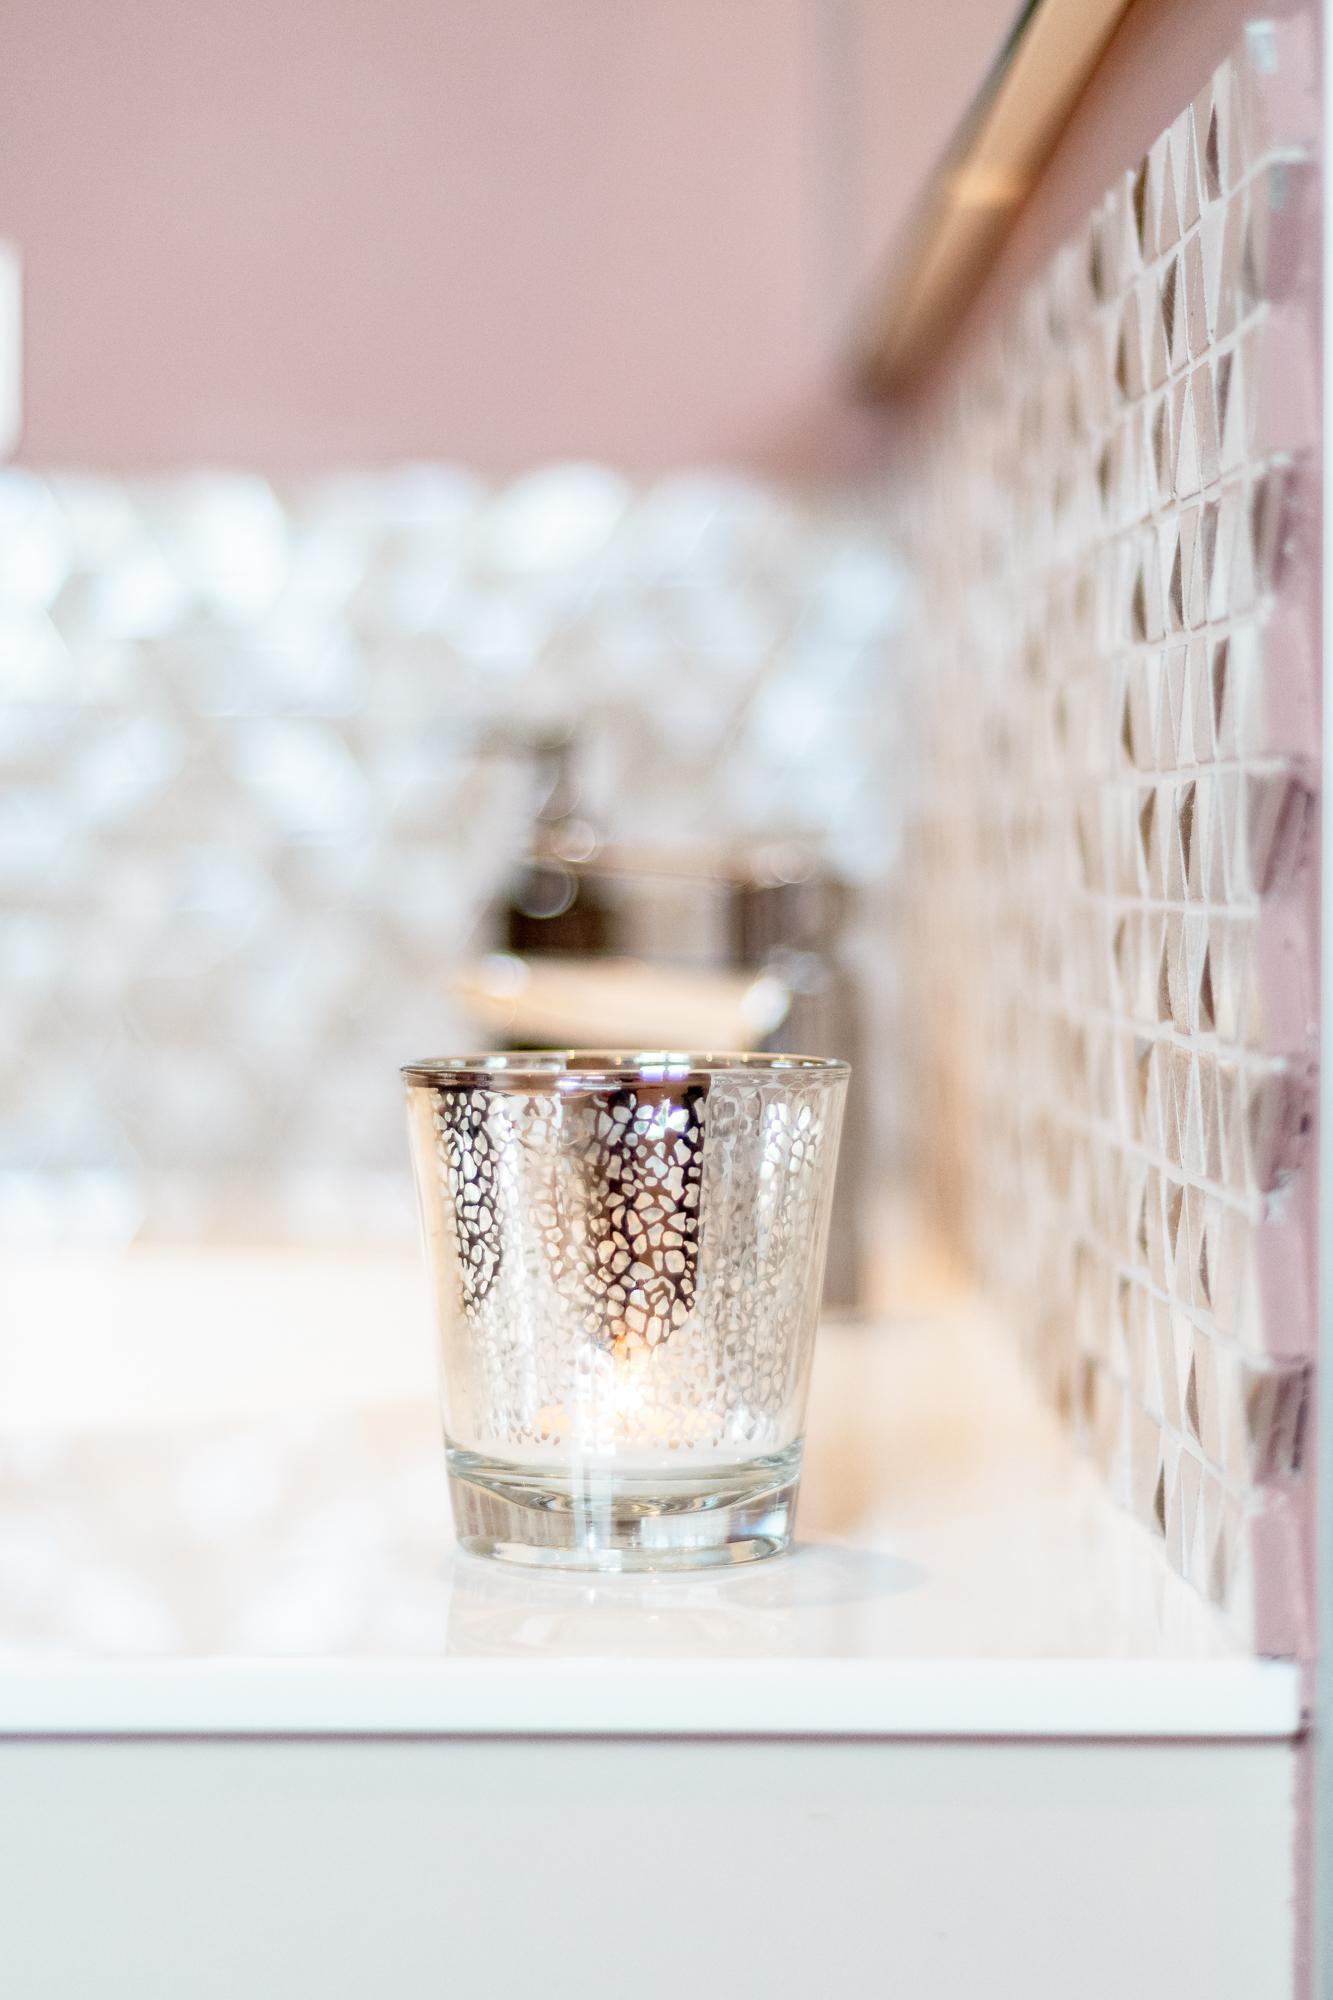 mh-deco-valence-salle-bains-mosaique